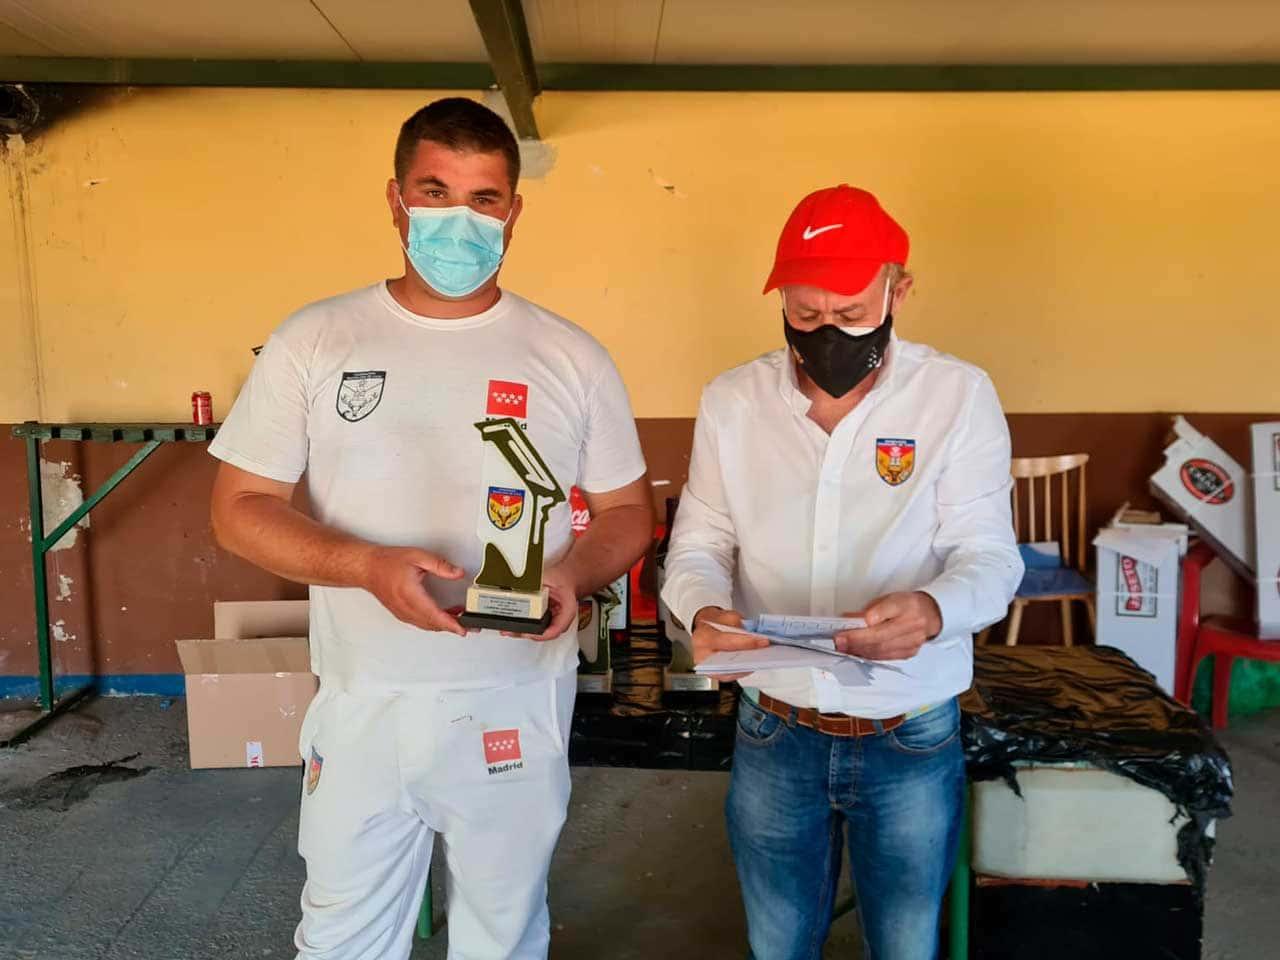 Campeonato Autonómico Blancos a Brazo 2021